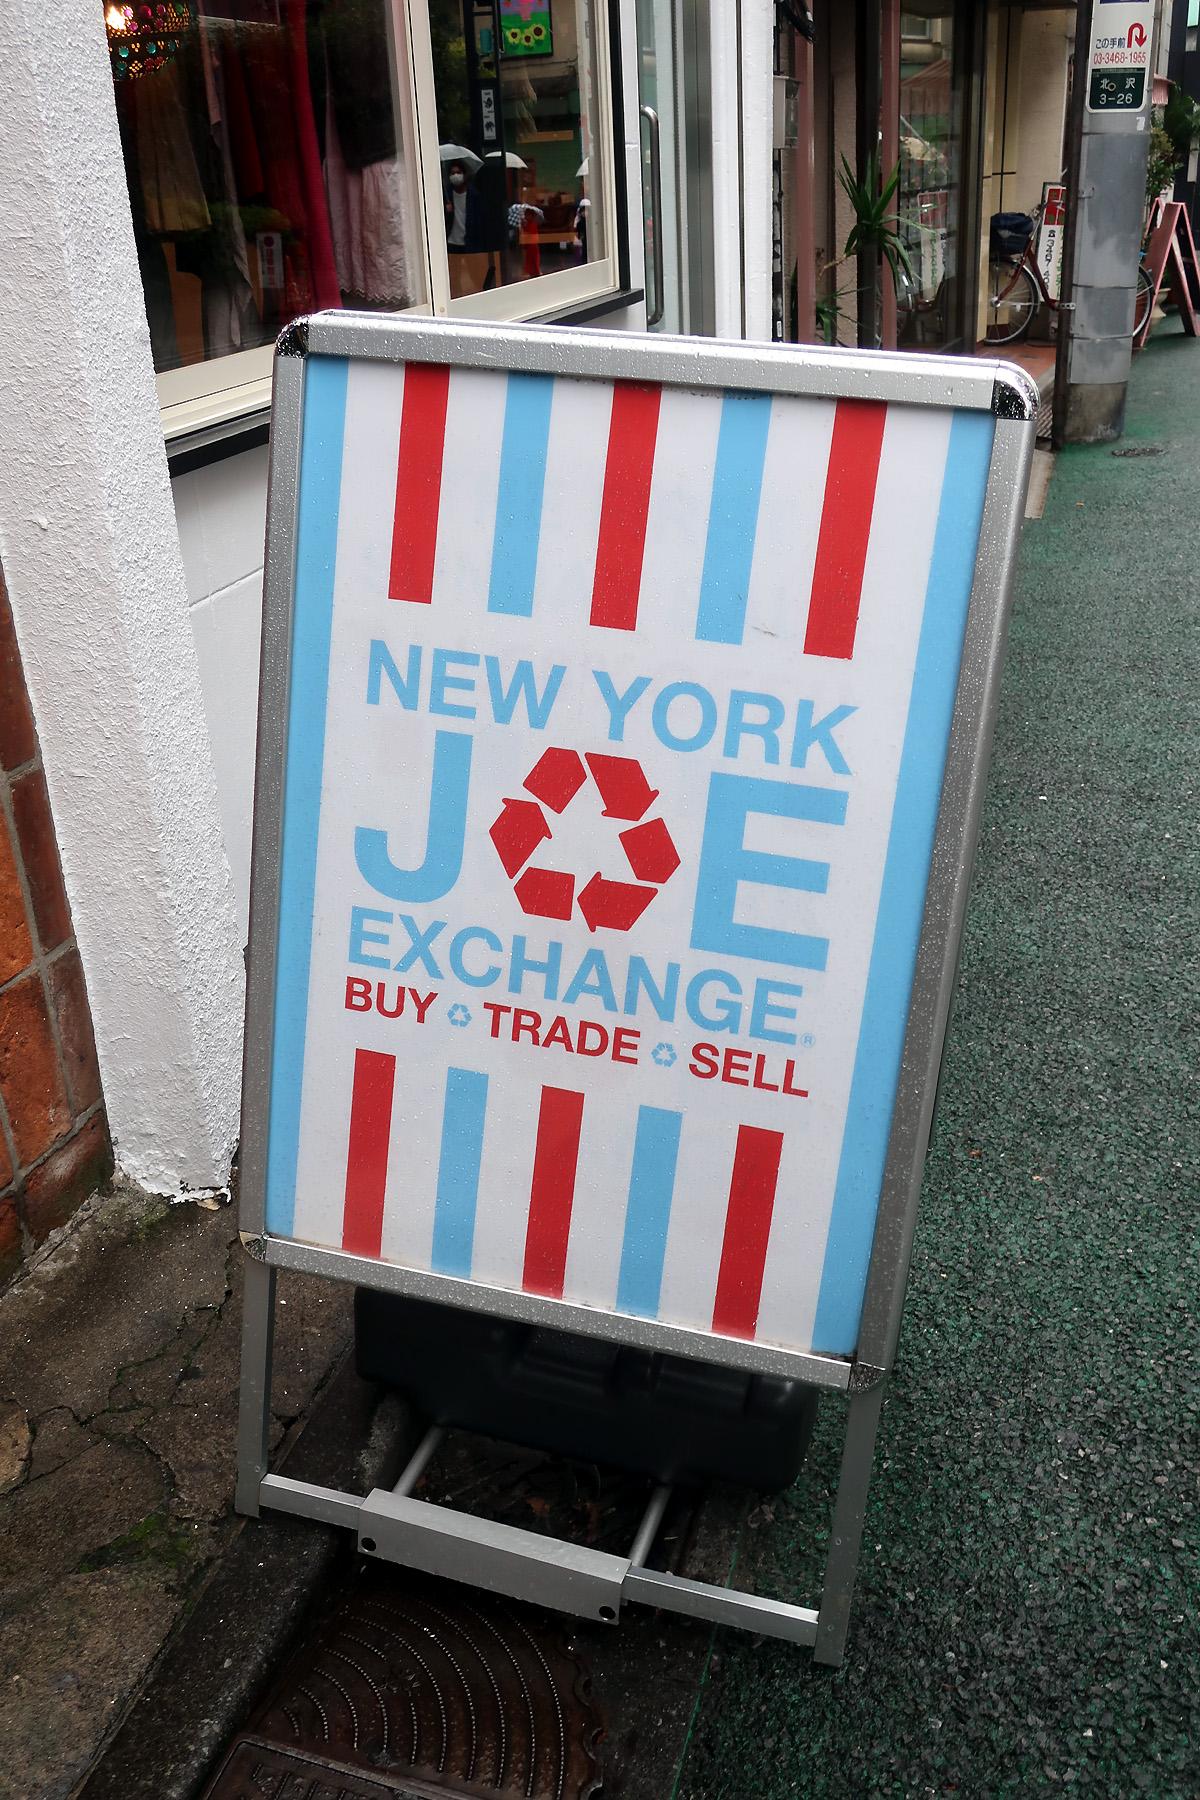 09_5 NEW YORK JOE EXCHANGE(旧八幡湯)世田谷区北沢3-26-4(2017_1028_143356)